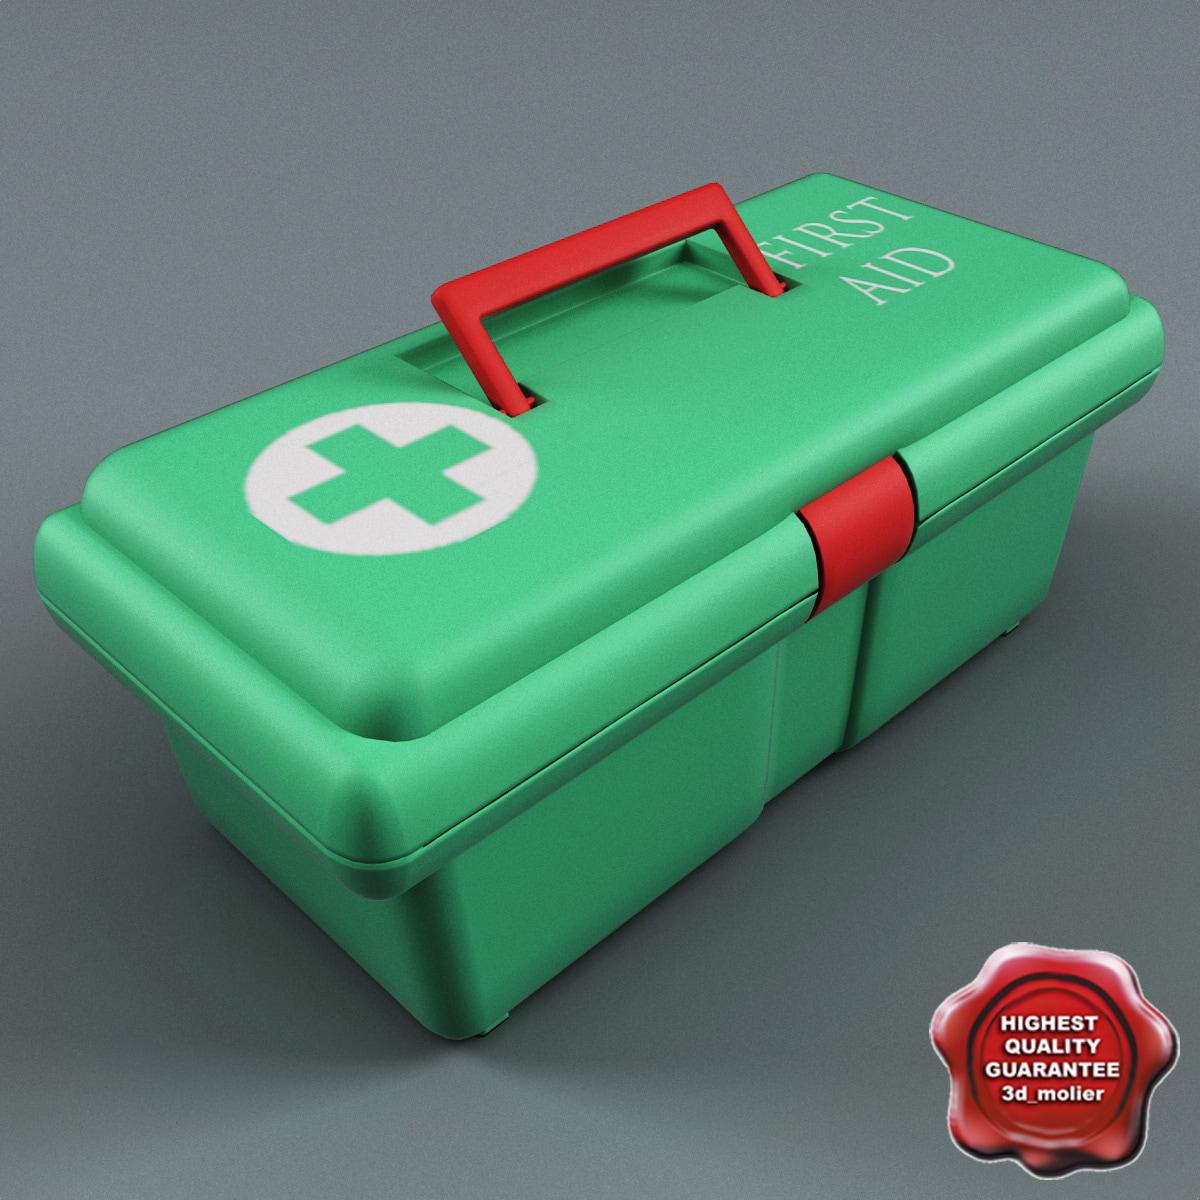 First_aid_kit_V3_00.jpg